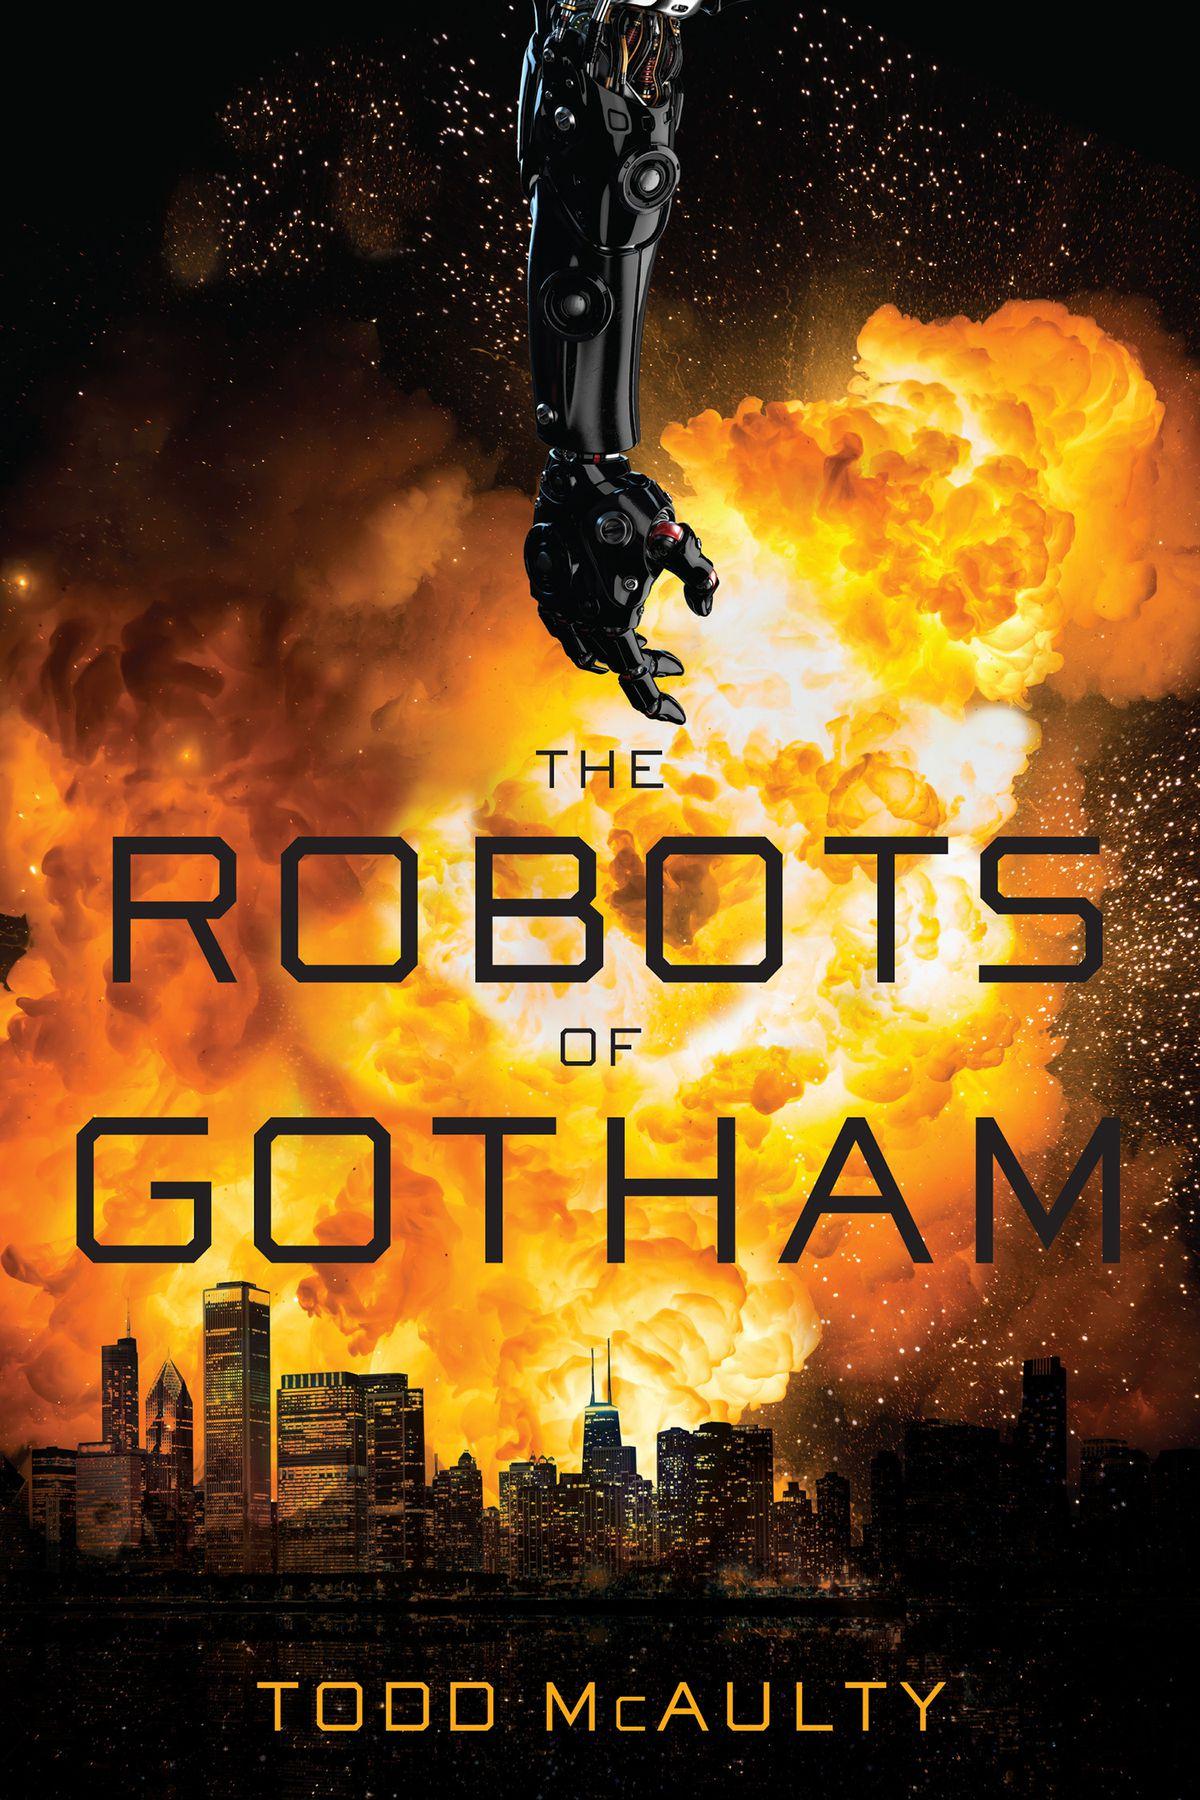 robots books gotham sci fi fiction science fantasy read todd future adult june plague child had series salt line horror